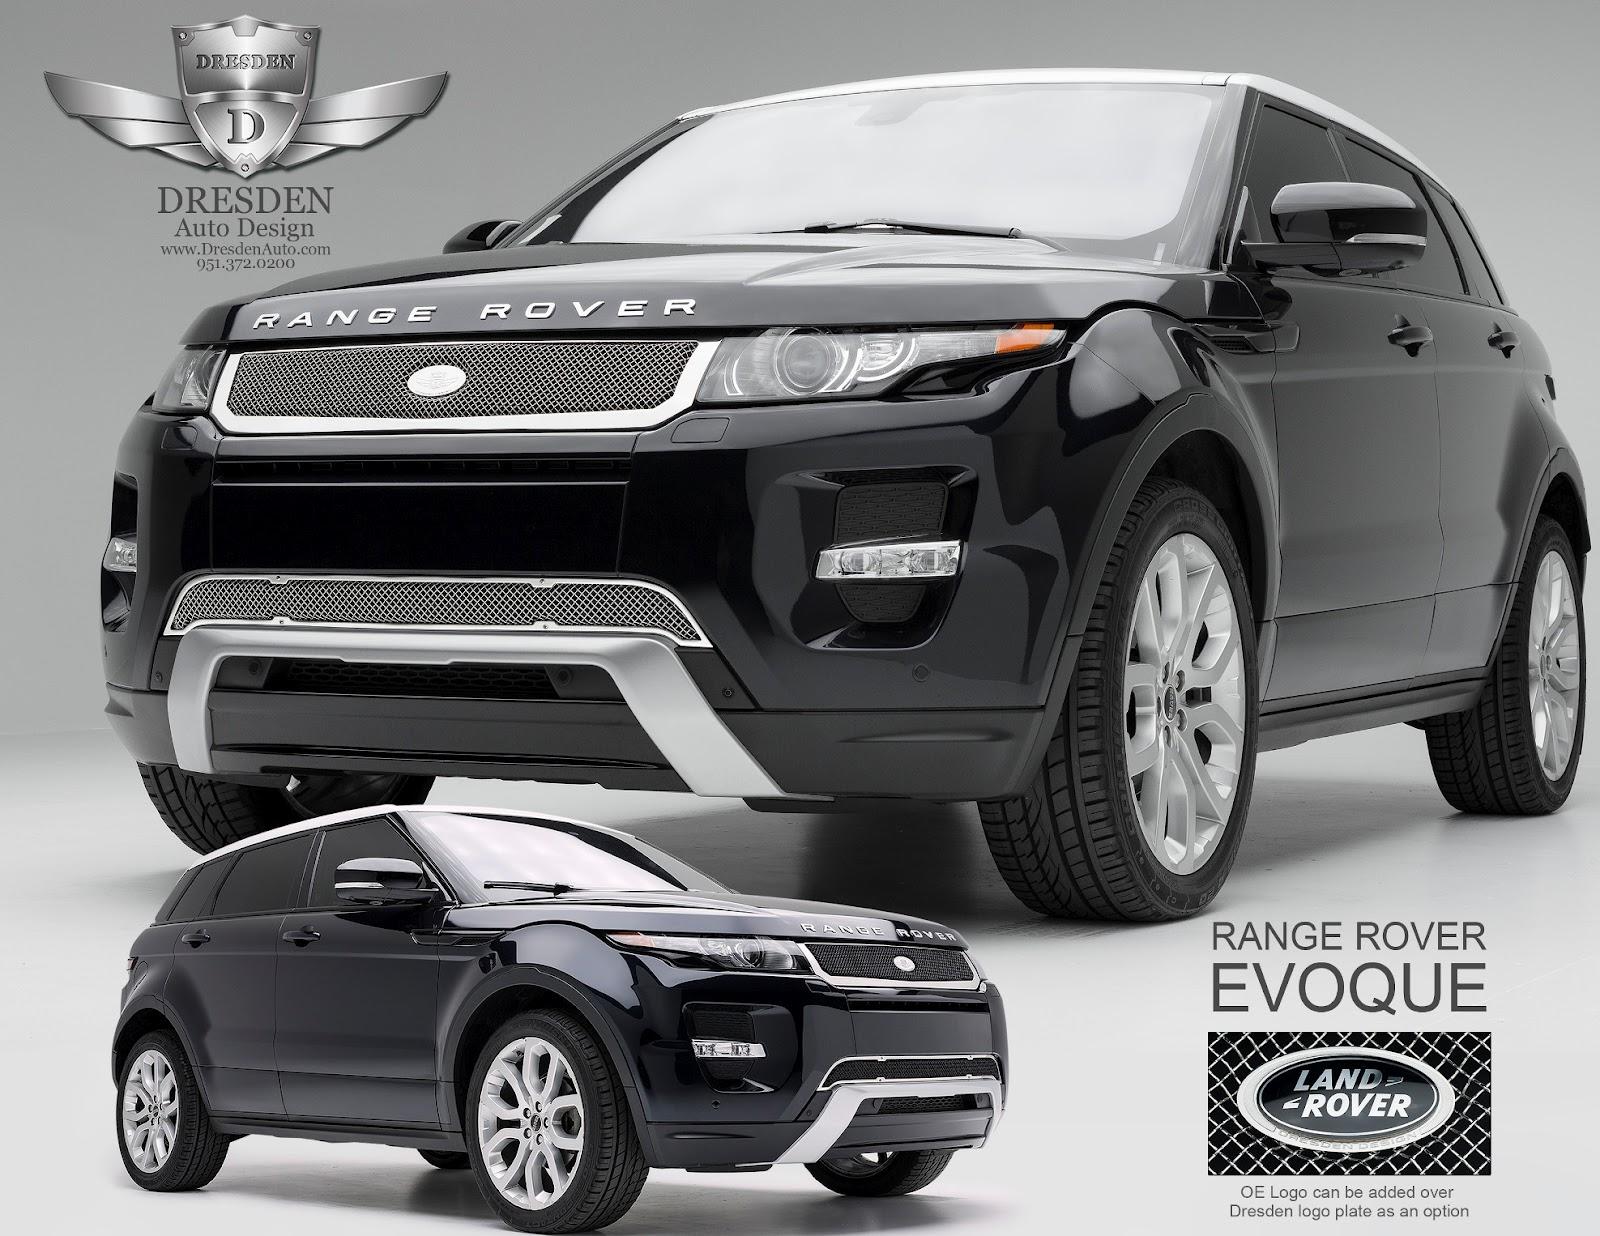 Land Rover Evoque Aftermarket Accessories >> Dresden Auto Announces New Brighton Luxury Grille For Range Rover